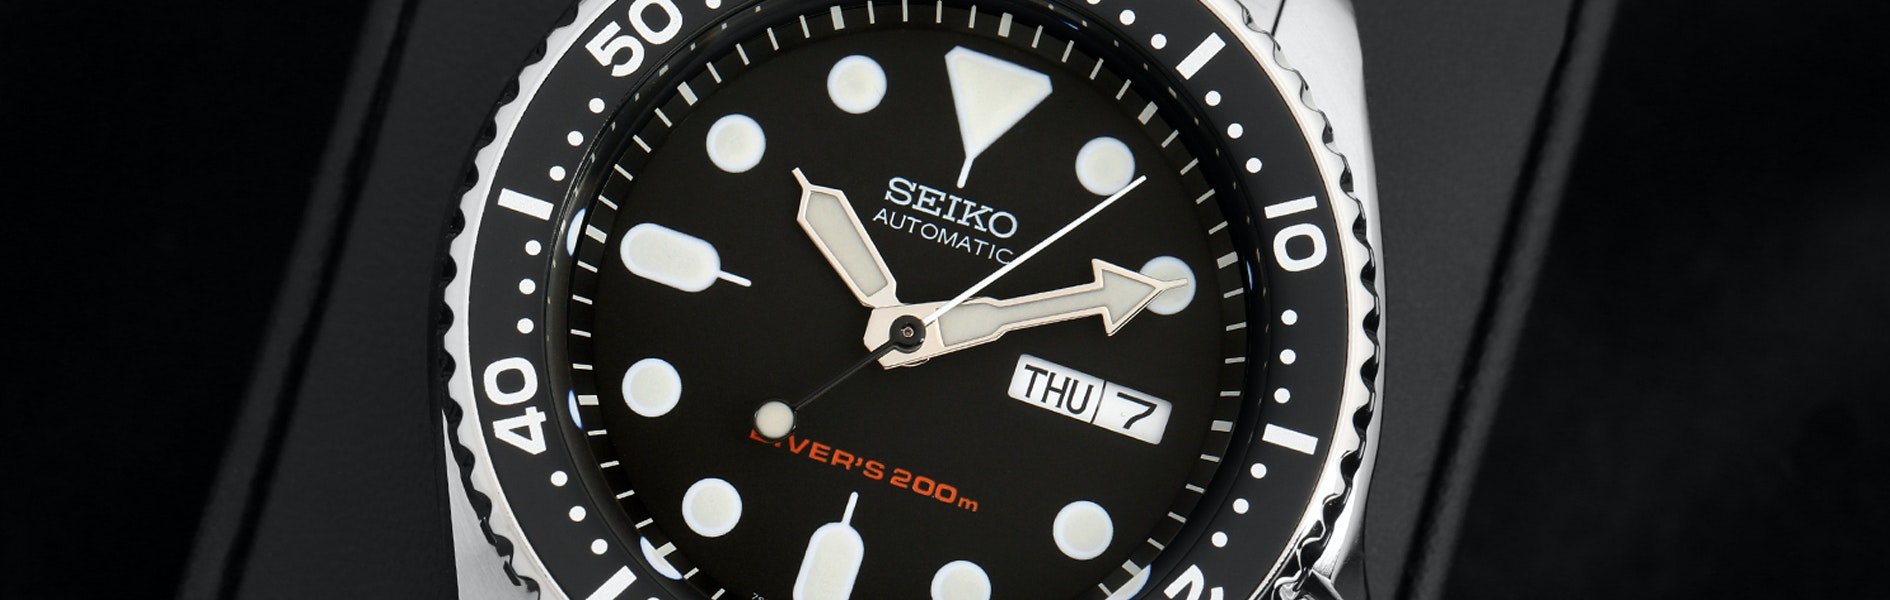 Seiko Core SKX Dive Watch